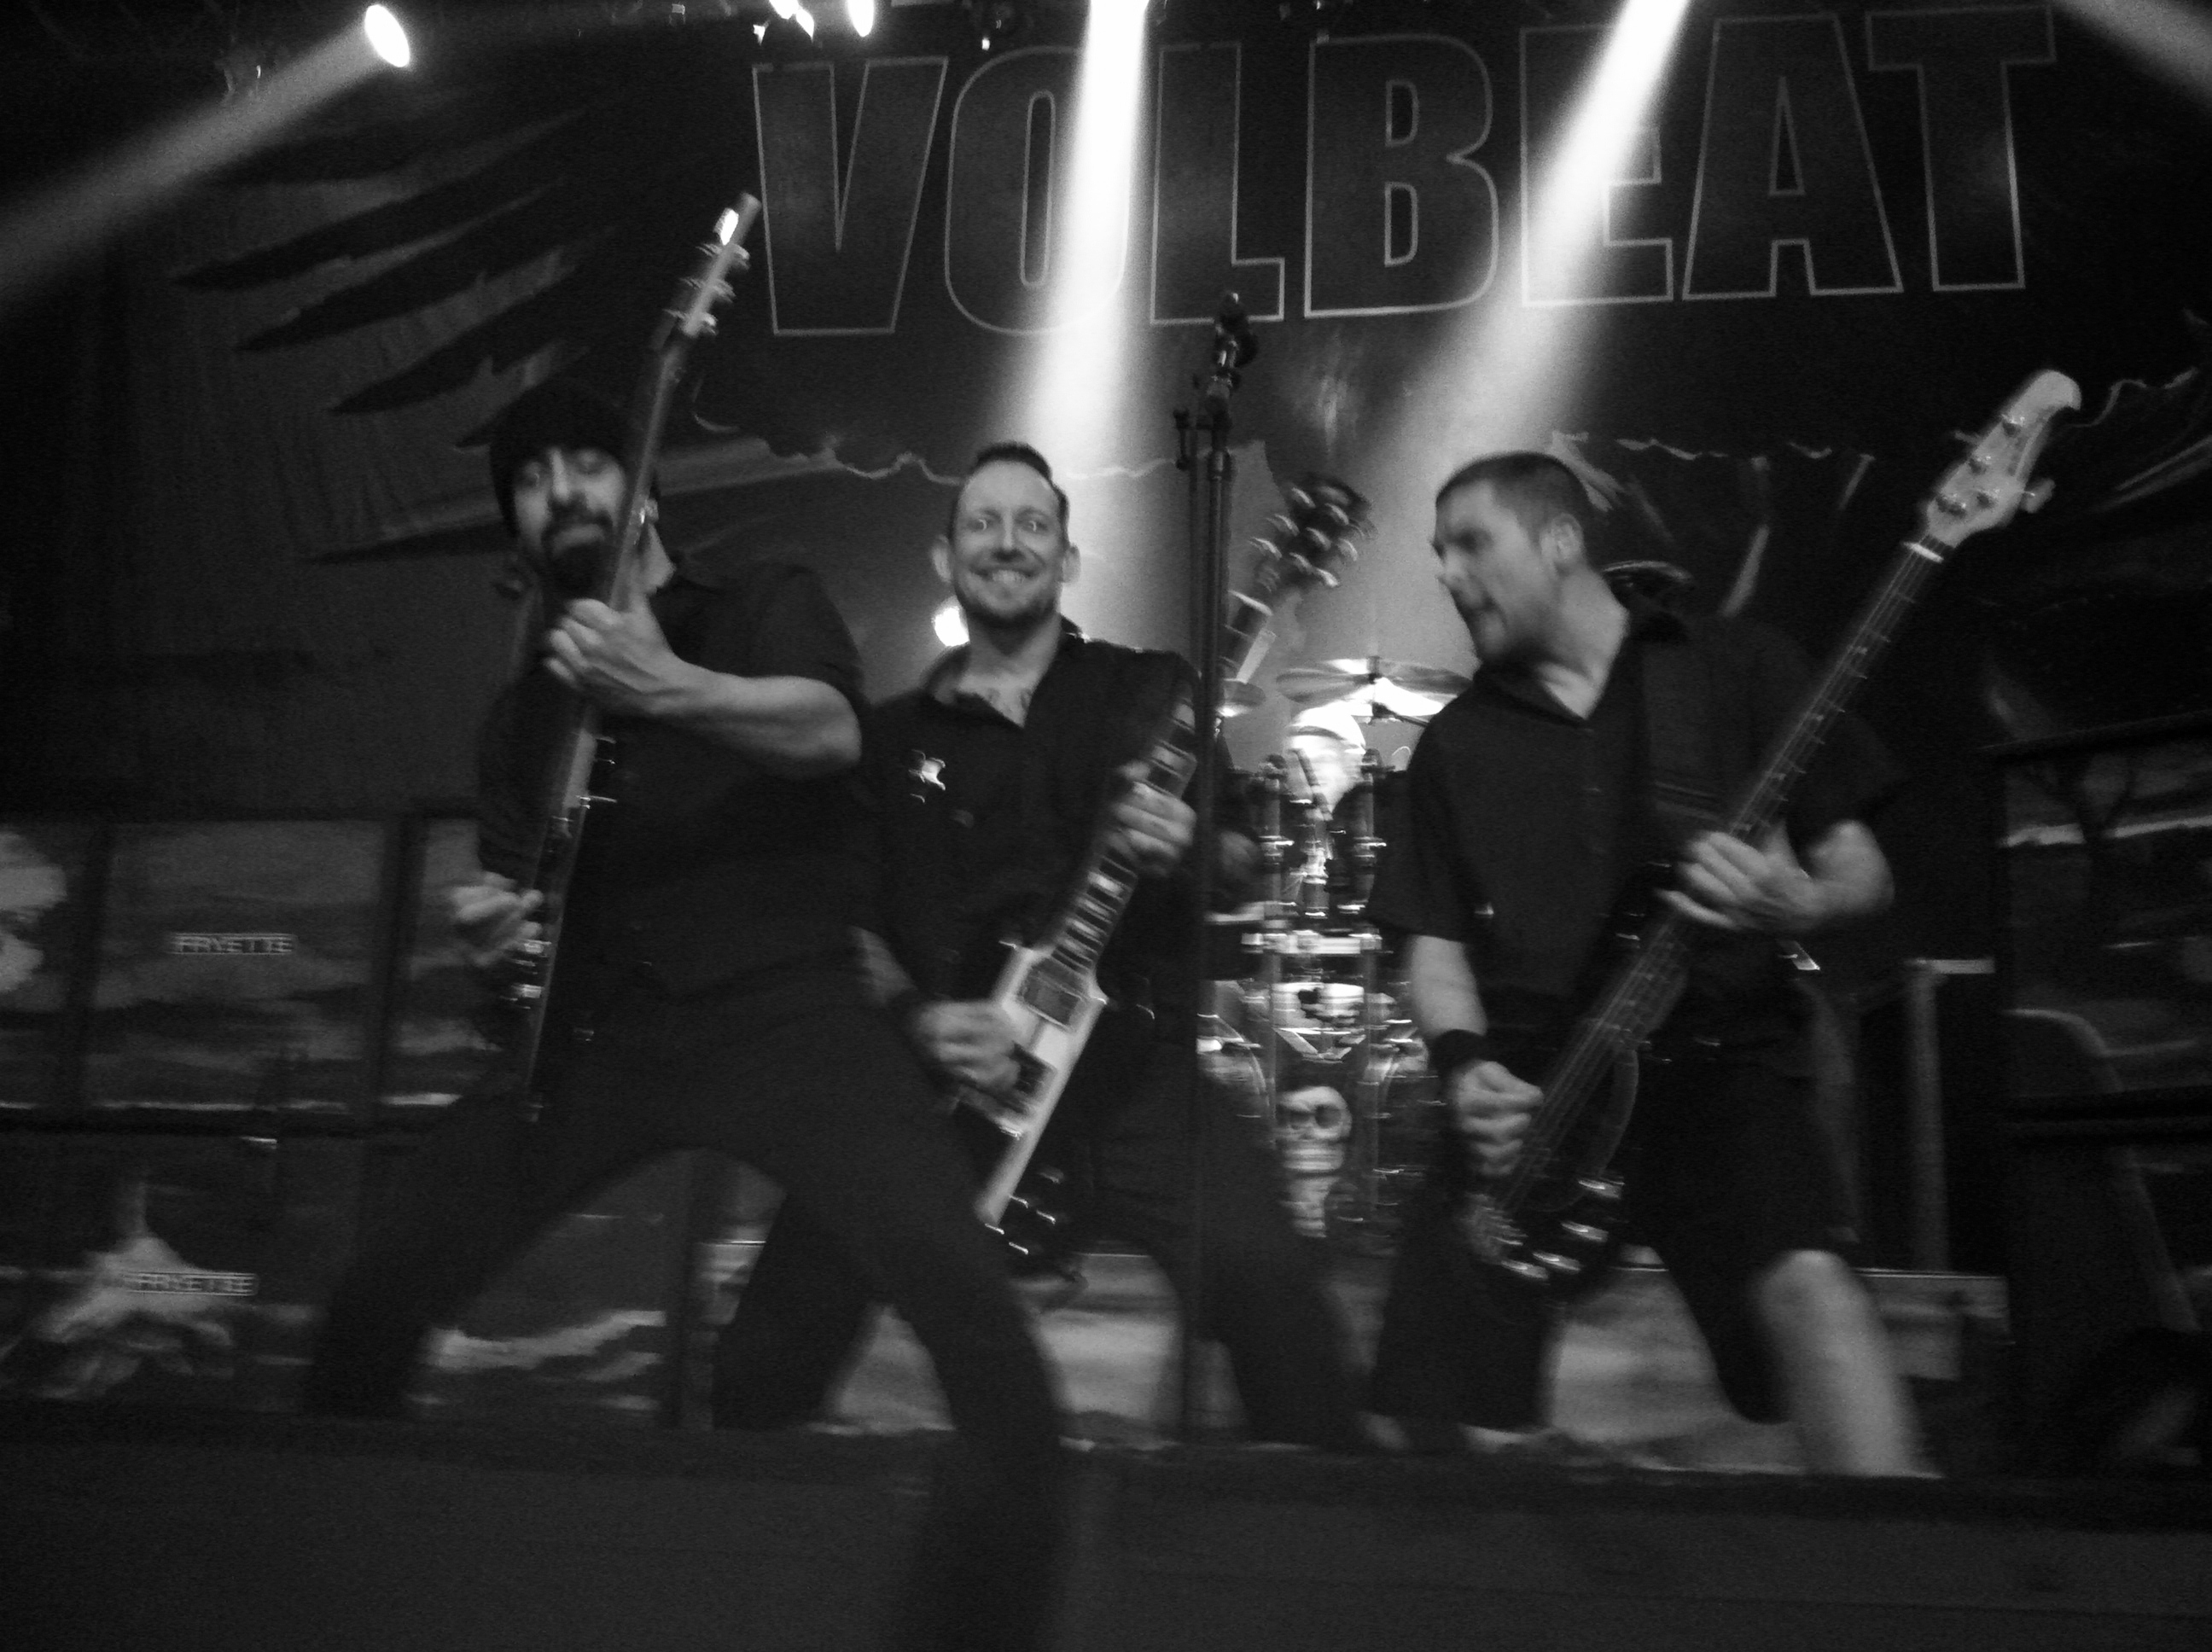 Volbeat7